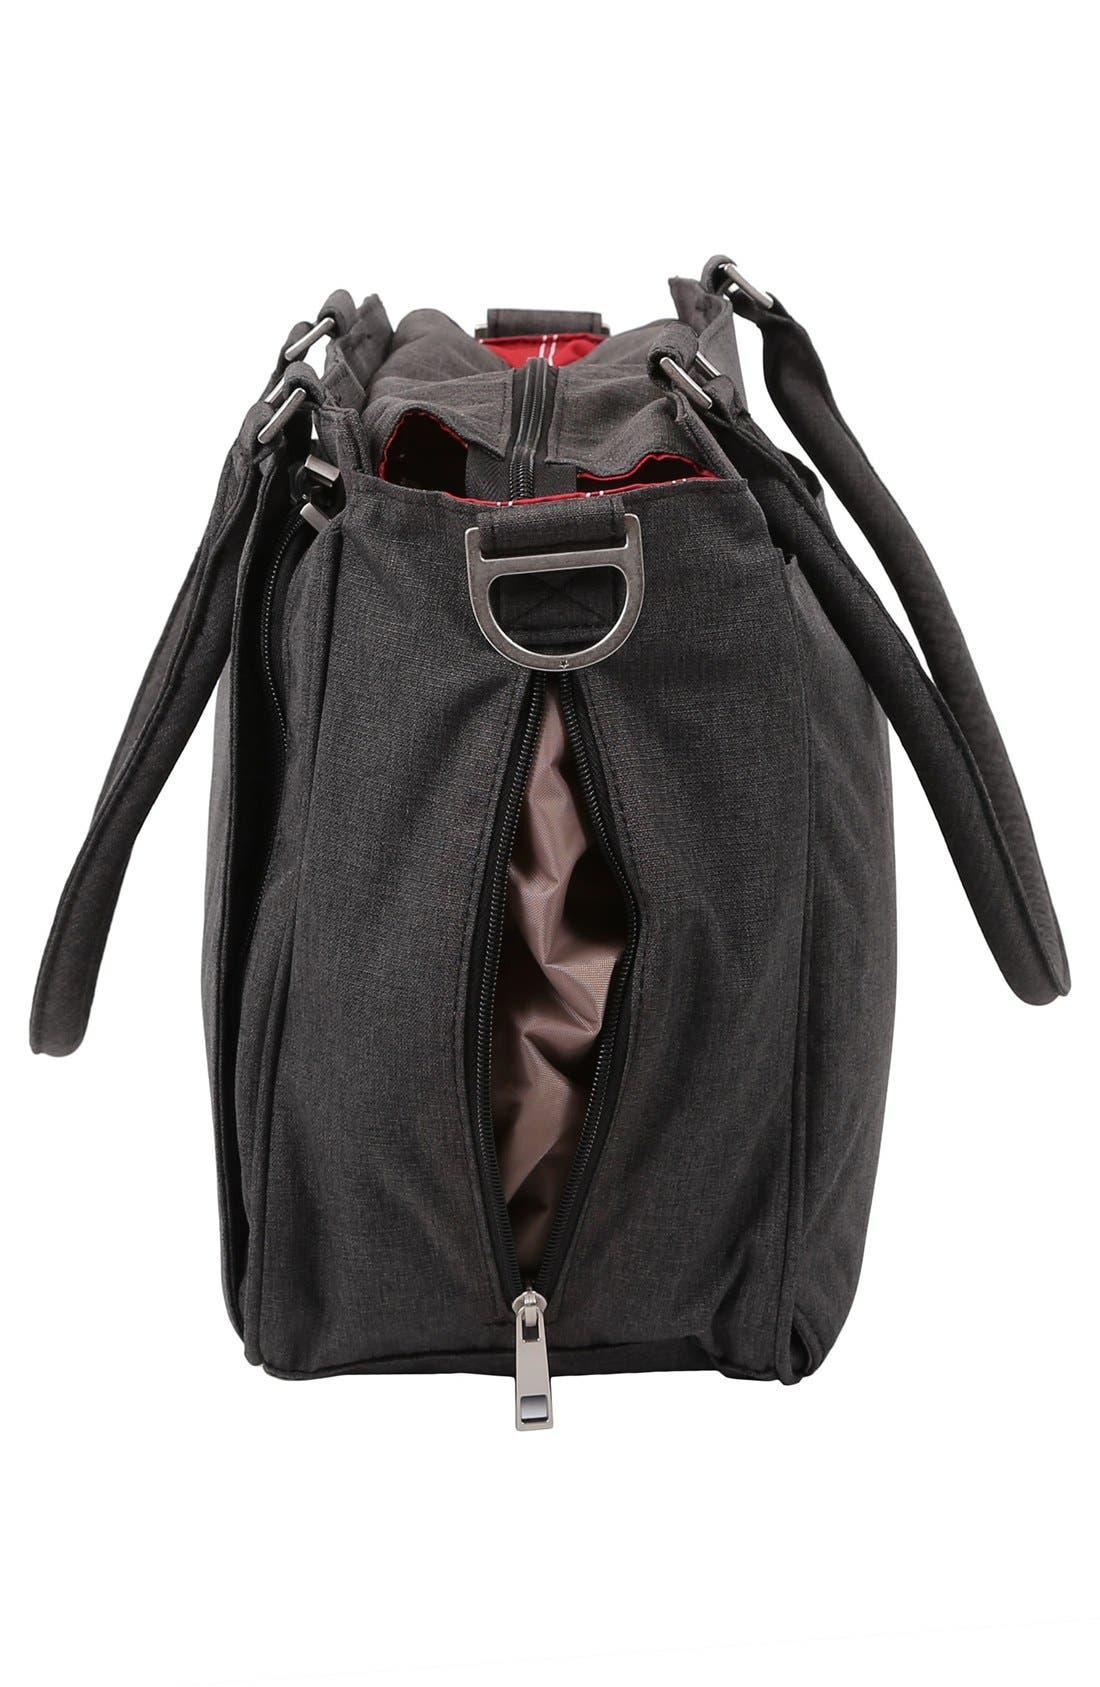 'Be Classy - Onyx Collection' Messenger Diaper Bag,                             Alternate thumbnail 3, color,                             Chrome